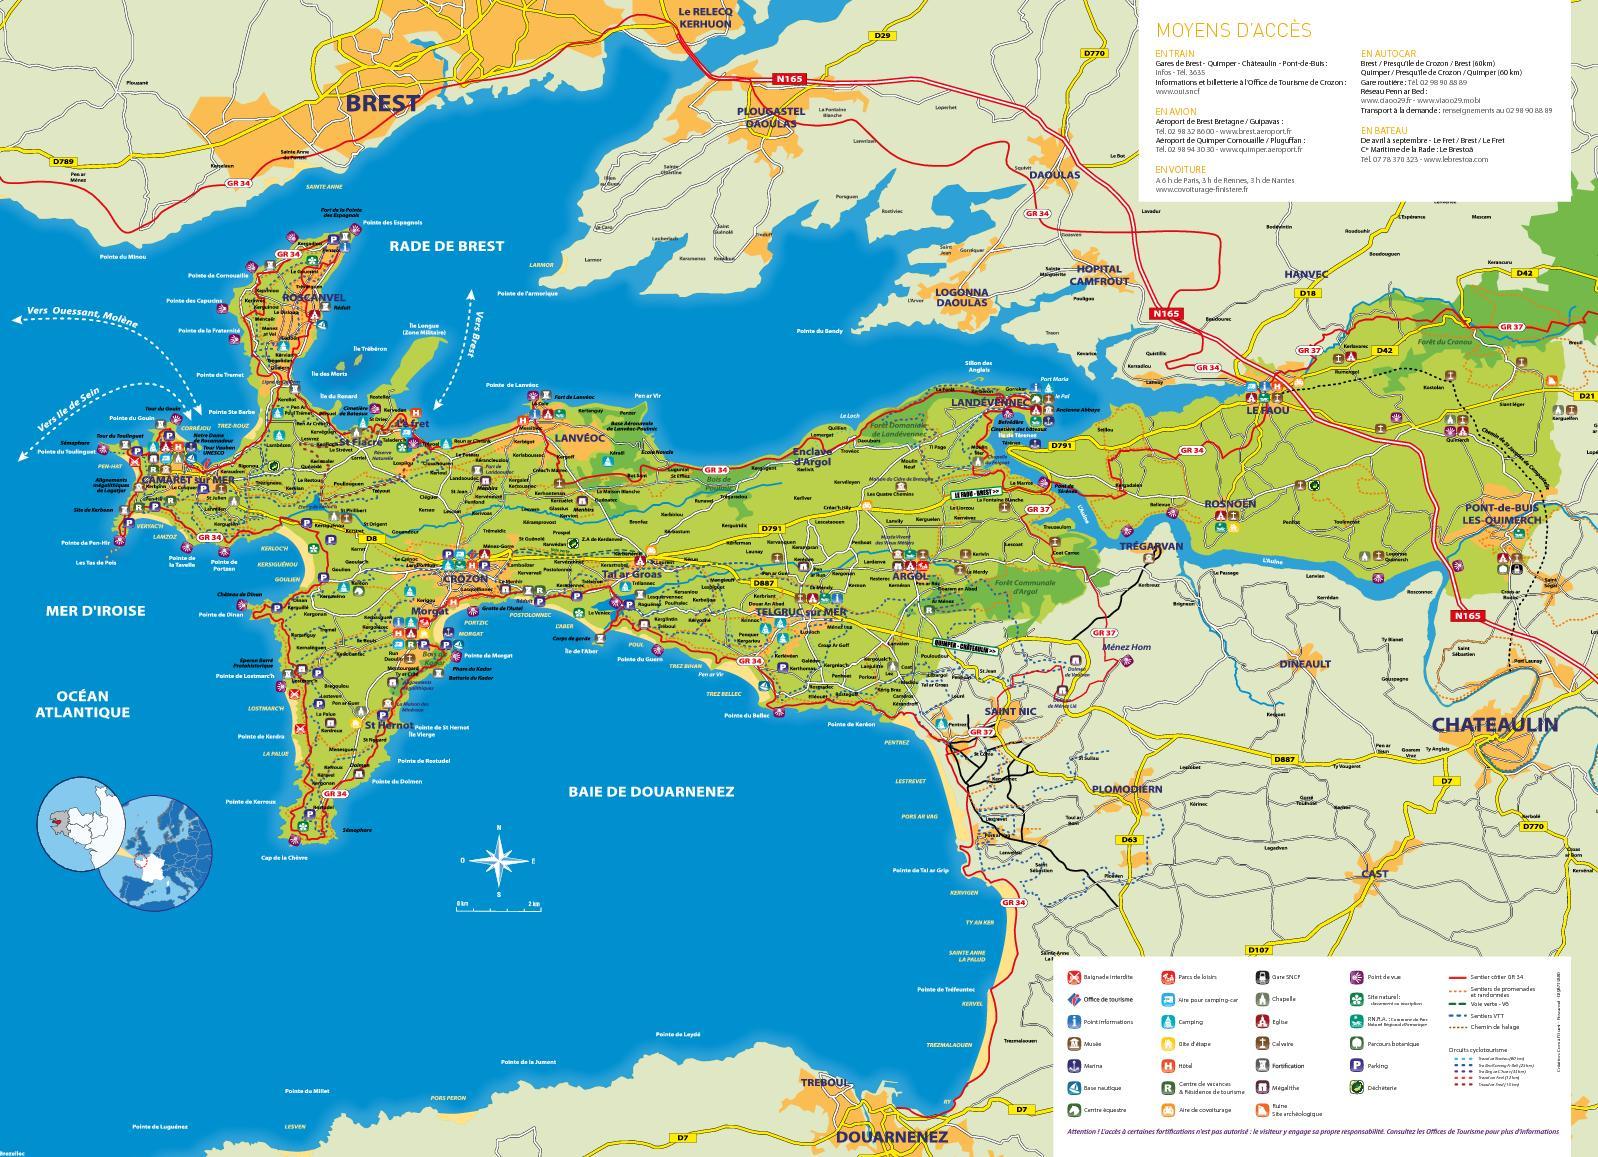 carte presqu île de crozon Carte Touristique / Presqu'île de Crozon   Aulne Maritime